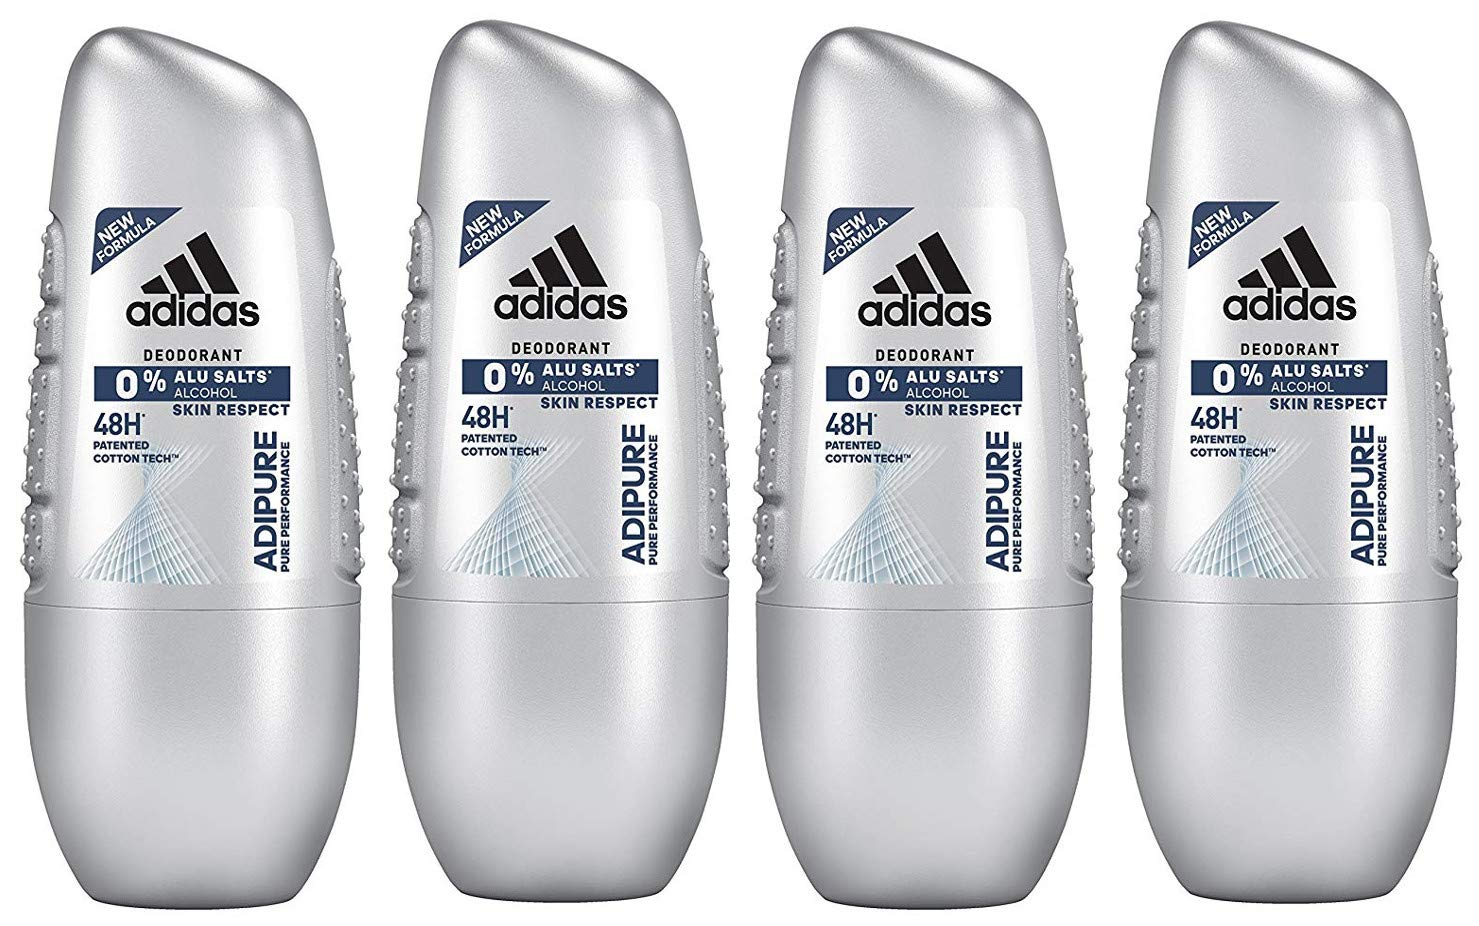 6 x 150ml Adidas Adipure 48H Deo Deospray Herren Deodorant